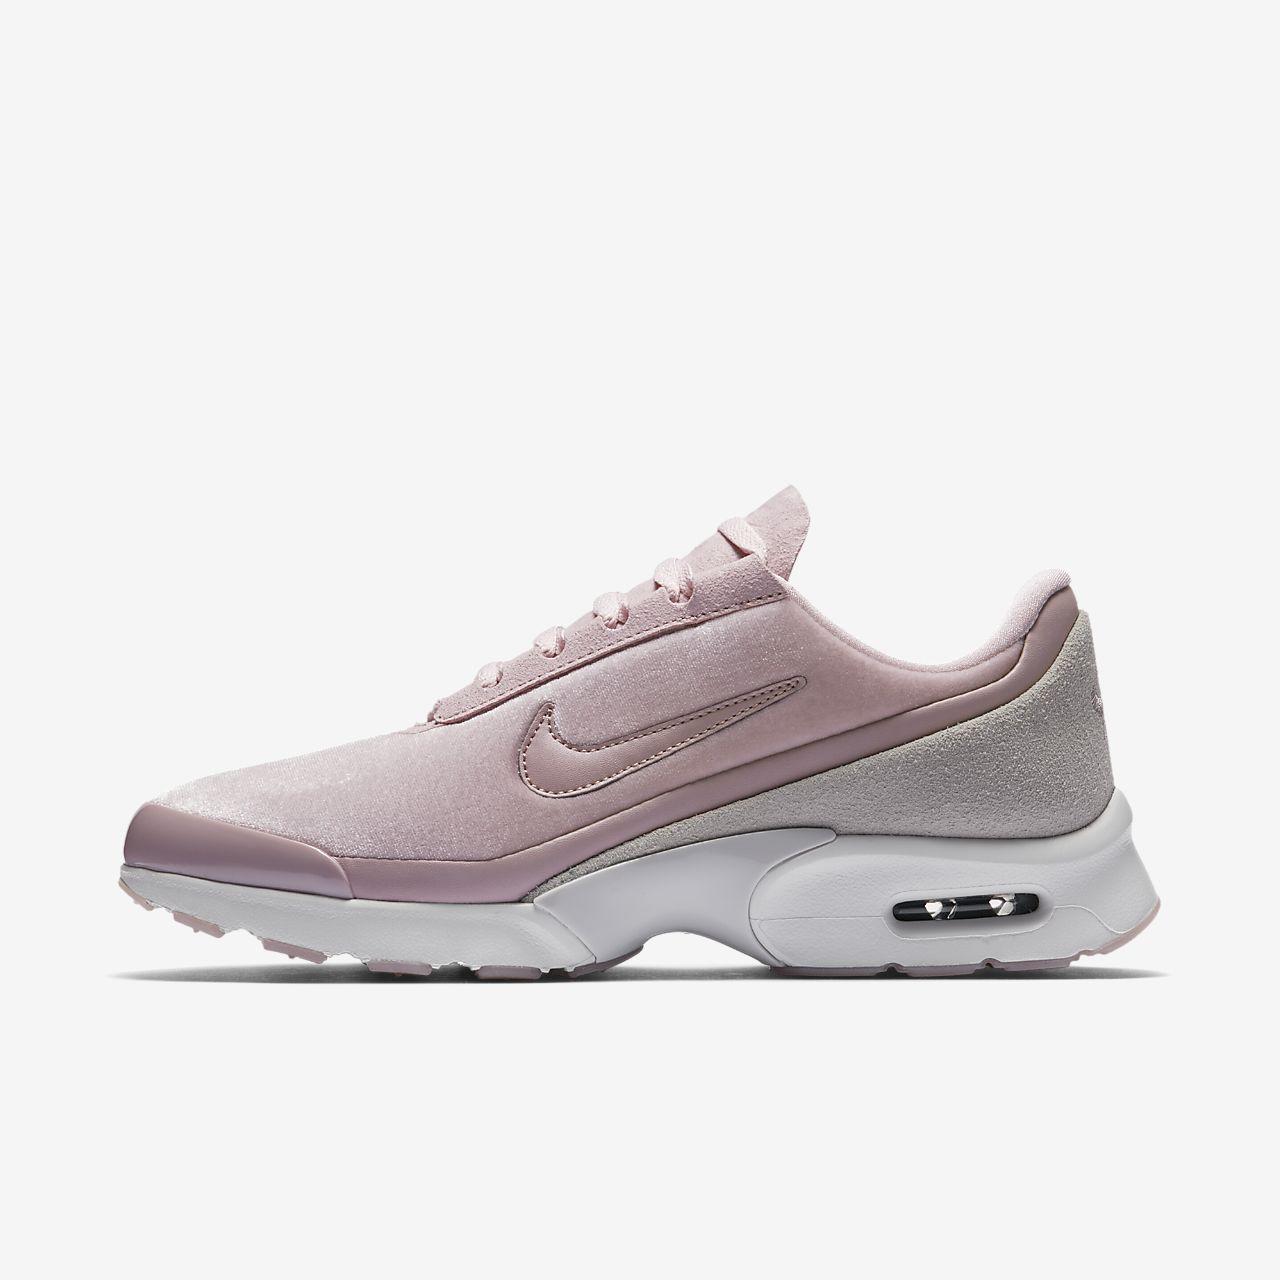 Chaussures Nike Air Max Gris Jewell À 40,5 Pour Les Femmes